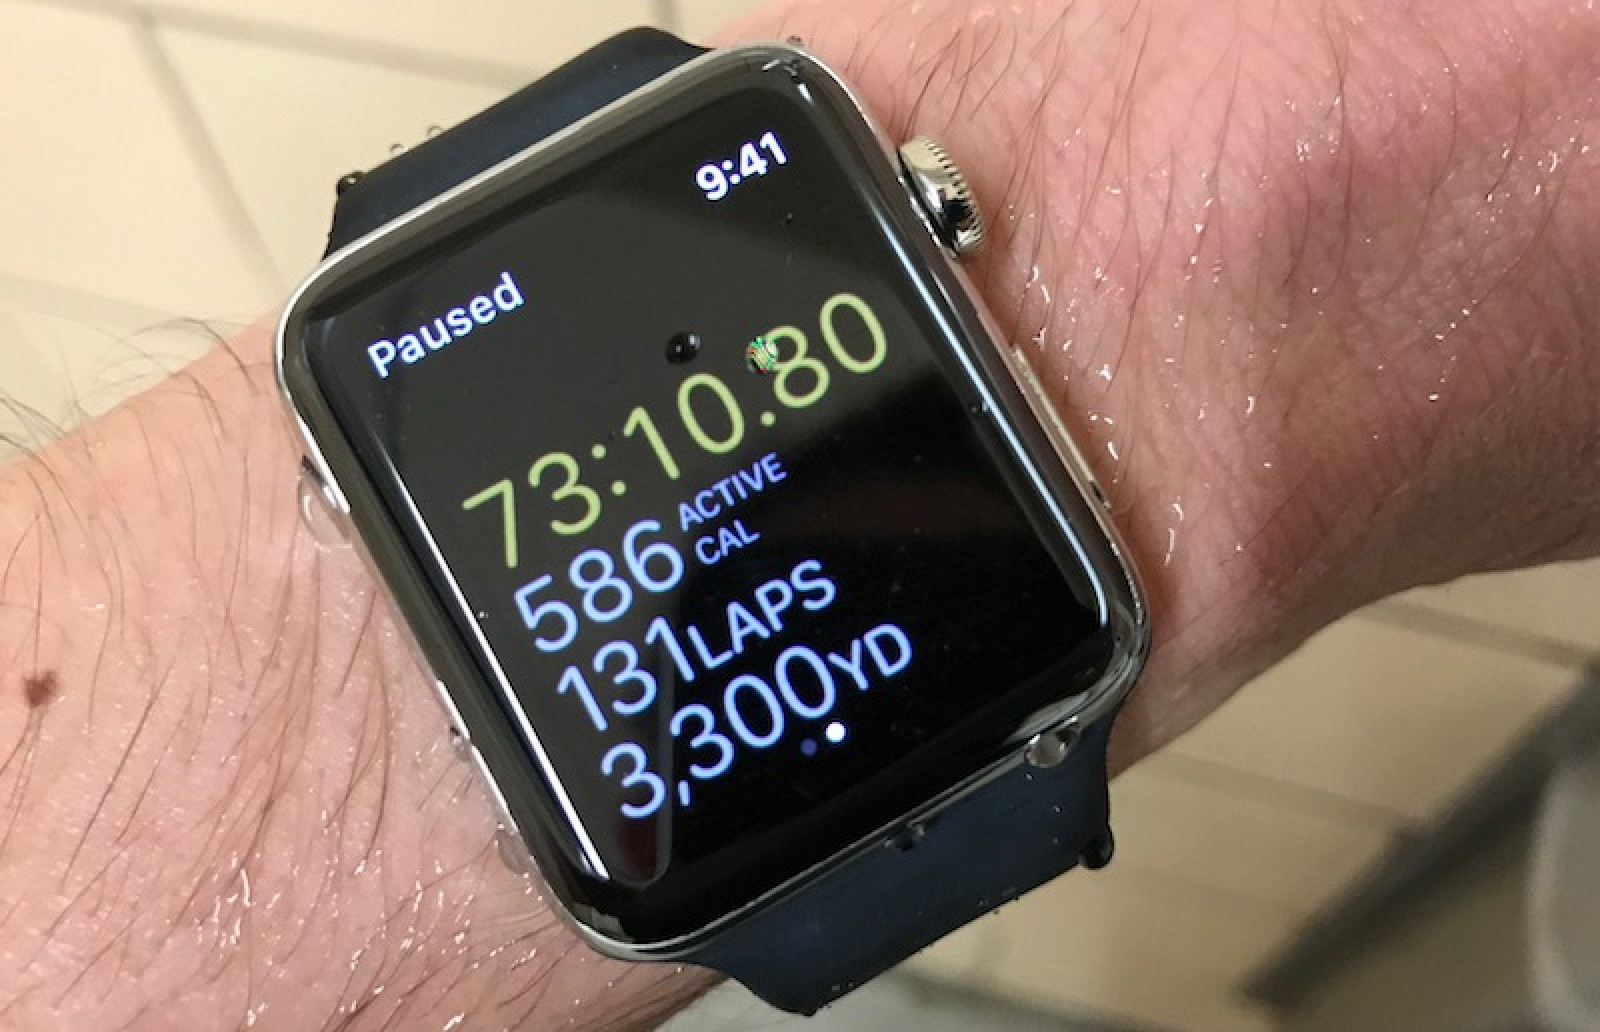 buy popular 9fac8 3b3b9 Apple Watch Series 2: A Swimmer's Perspective - MacRumors